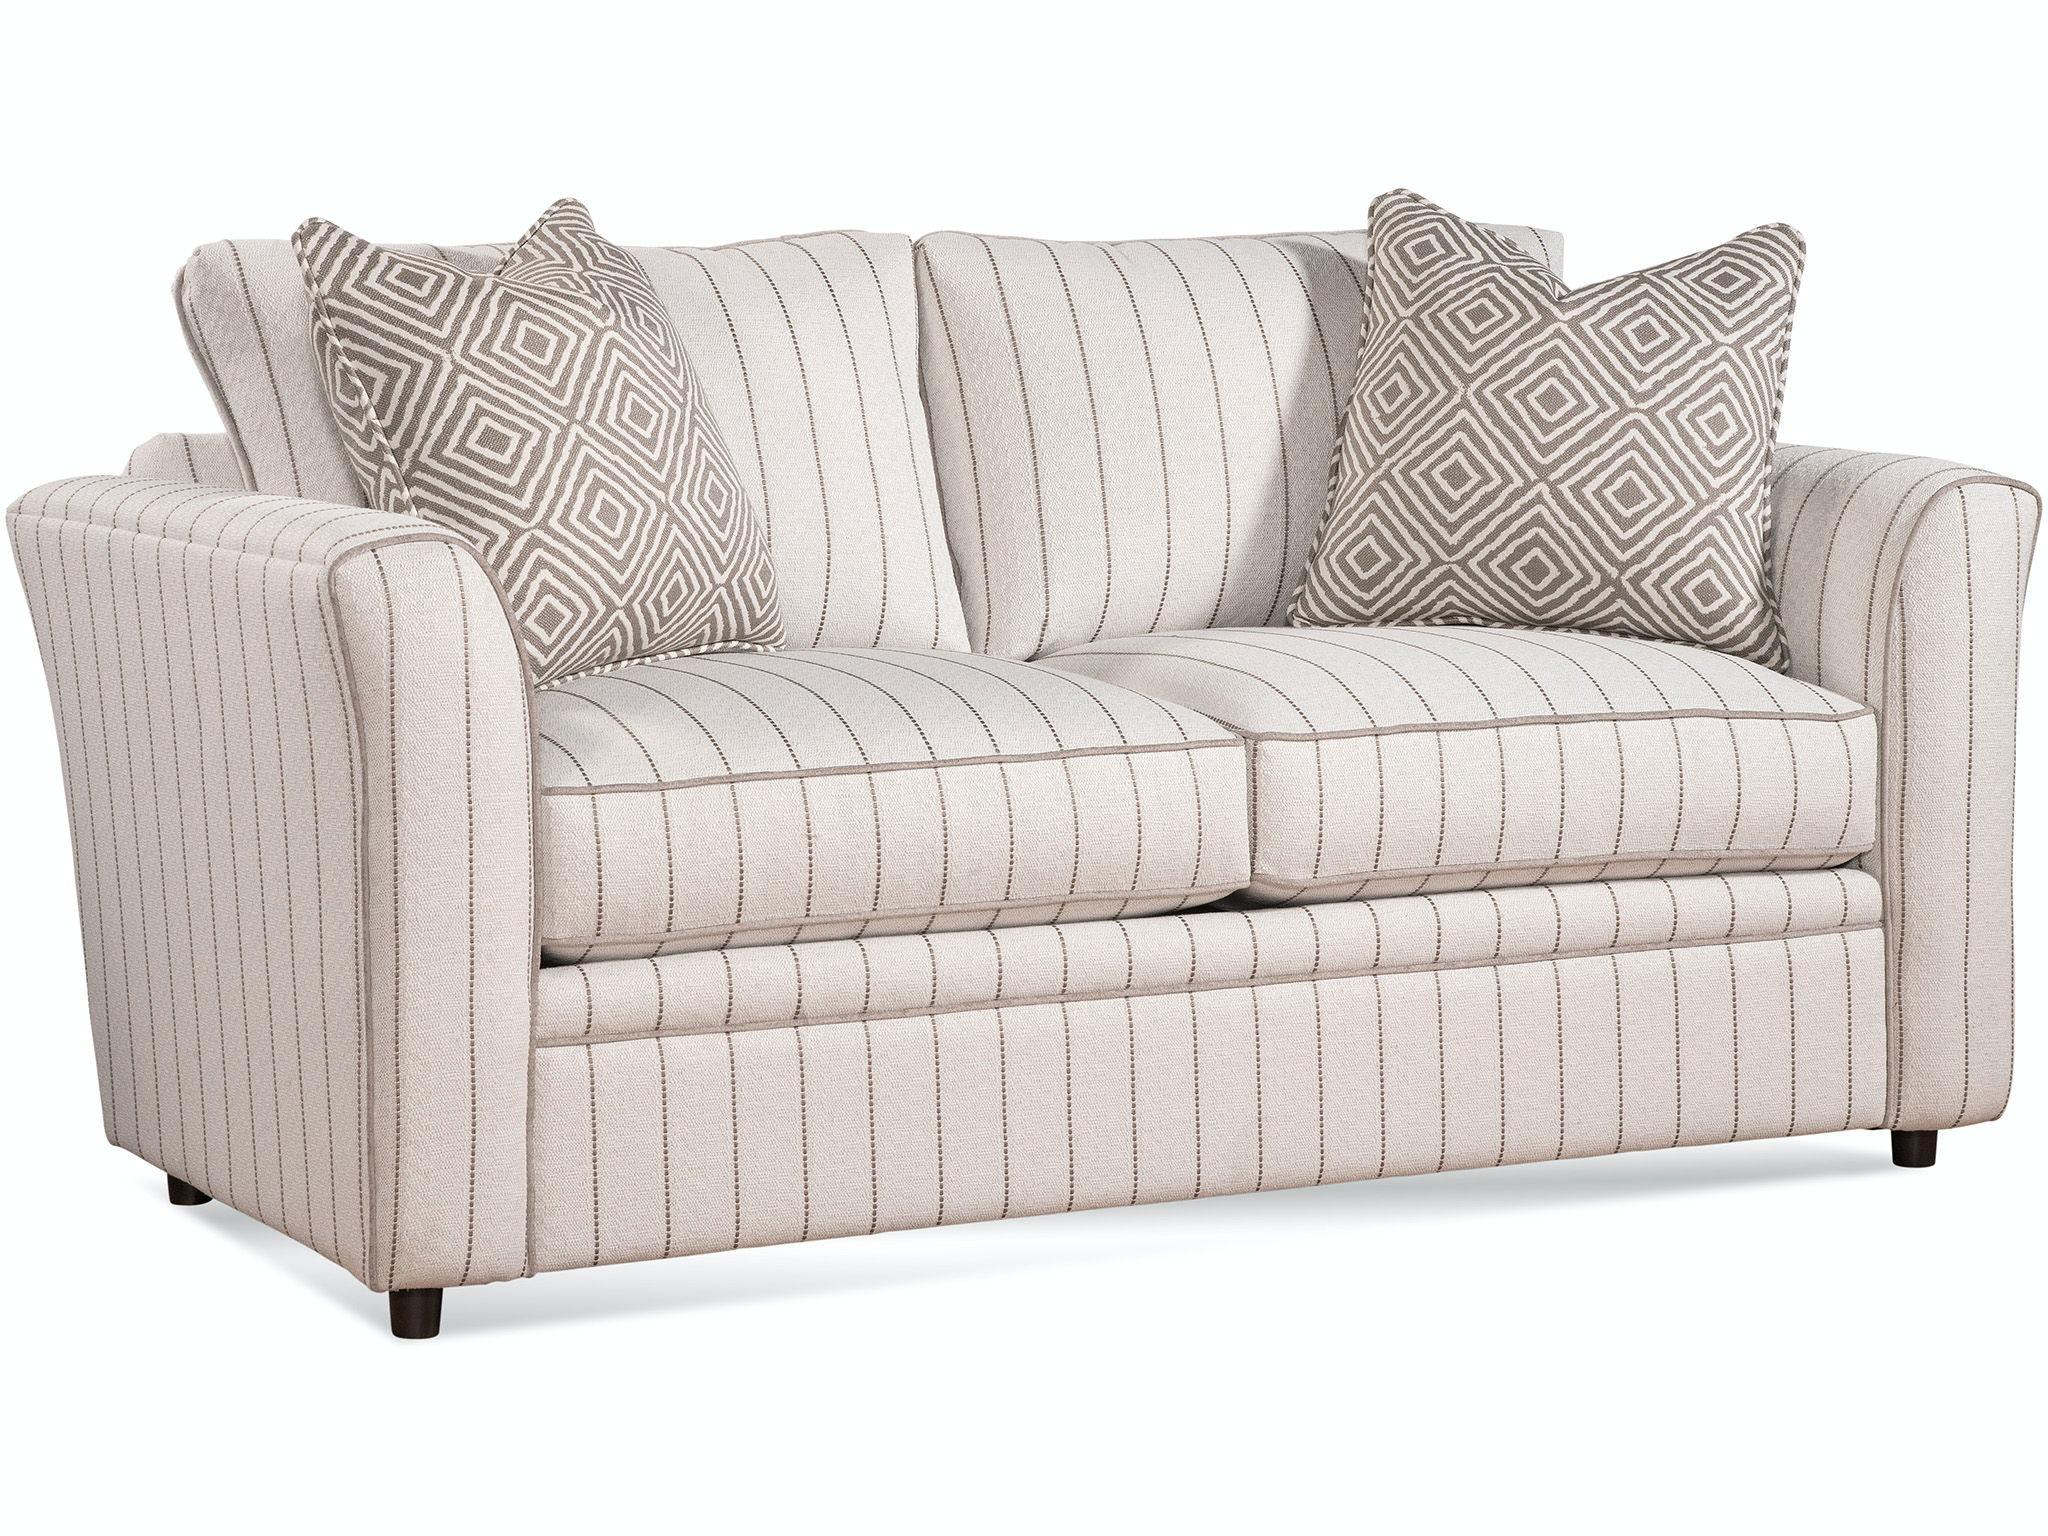 Braxton Culler Sofa 550 010